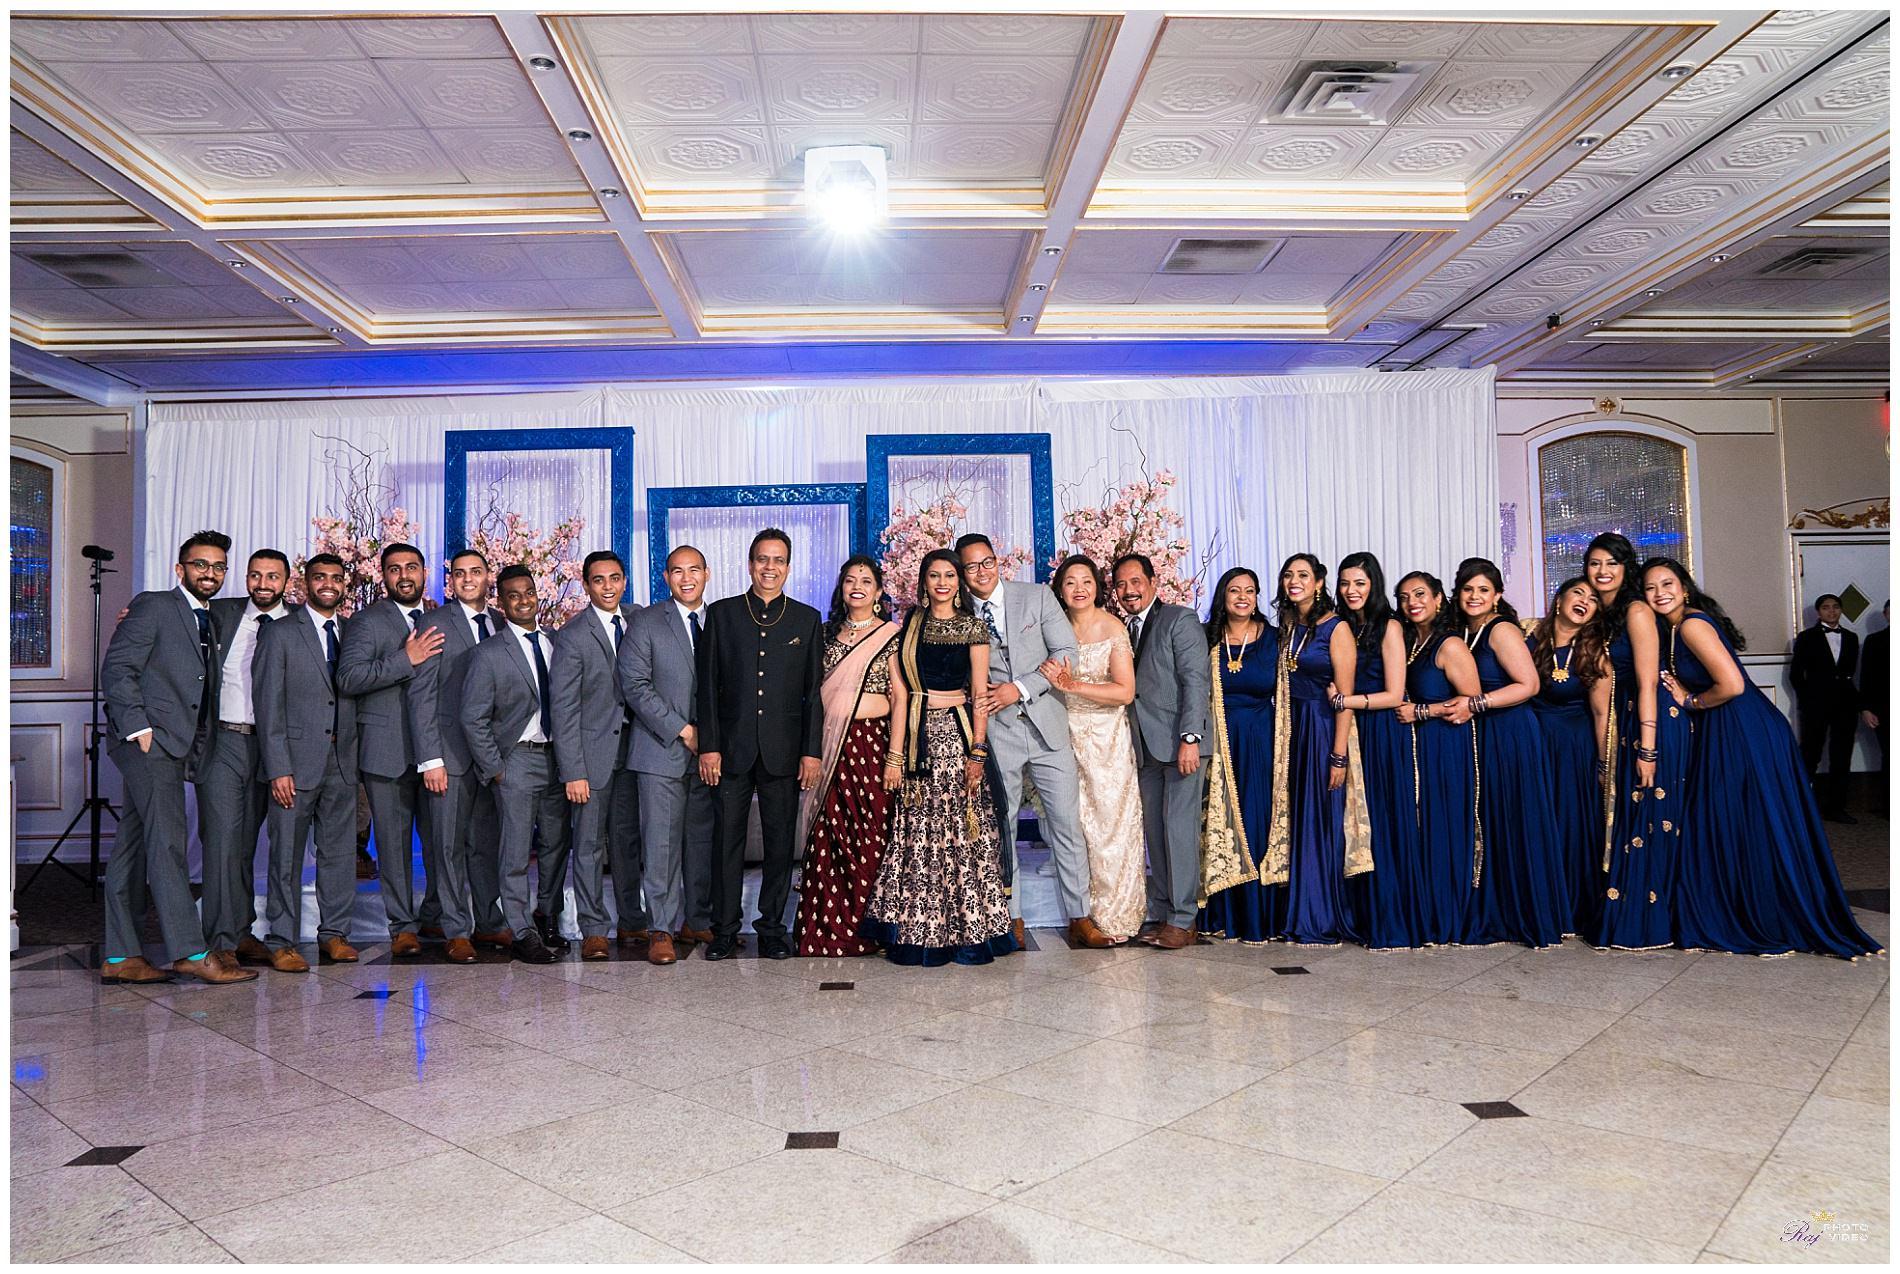 Royal-Manor-Garfield-NJ-Christian-Wedding-Ceremony-Khusbu-Jeff-63.jpg